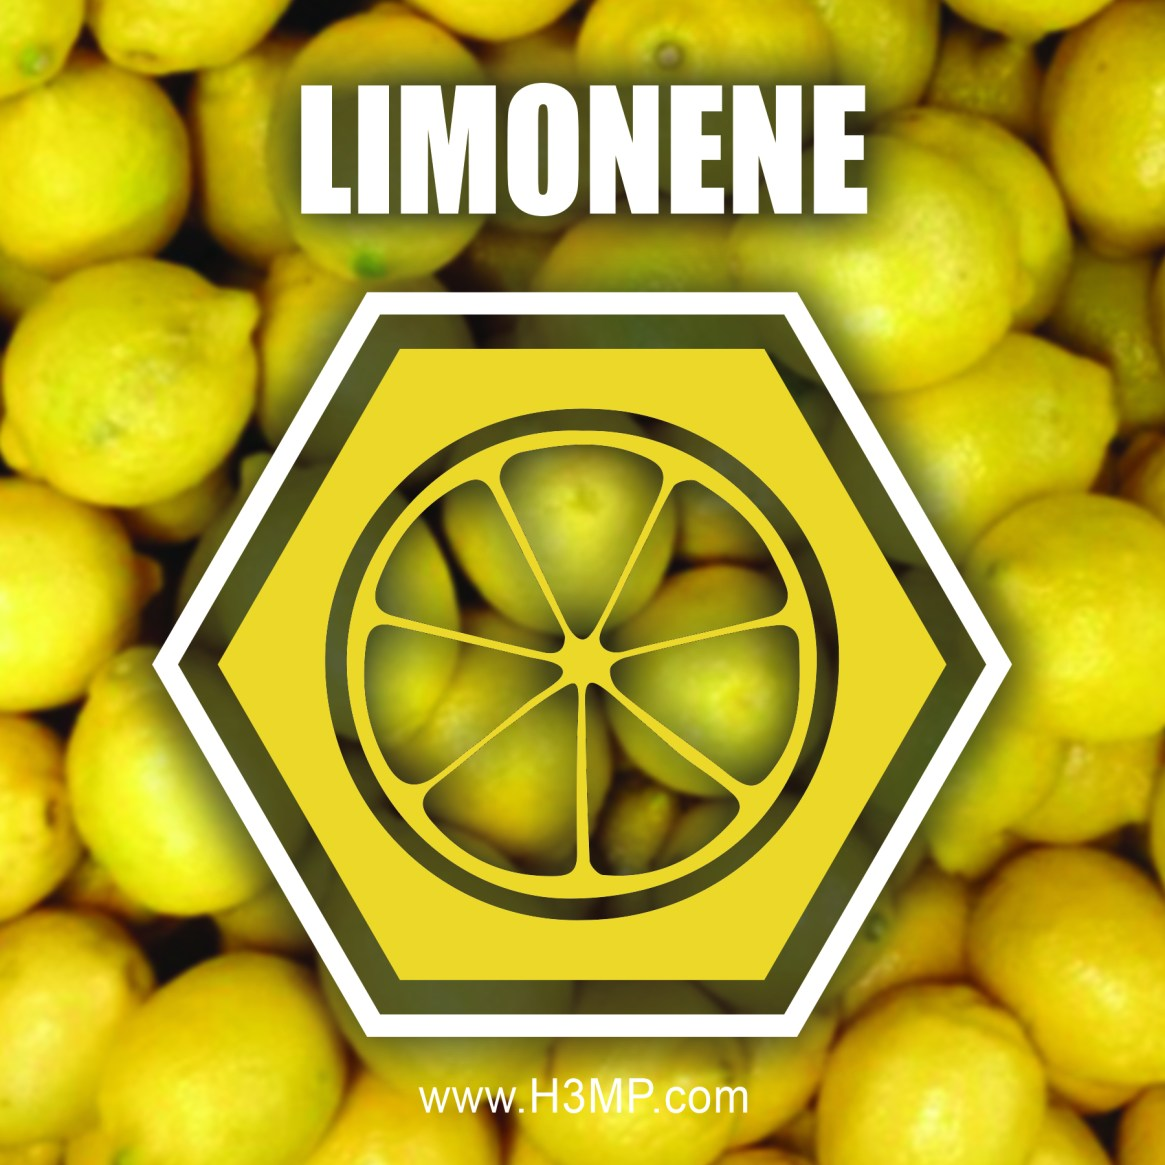 H3MP LIMONENE